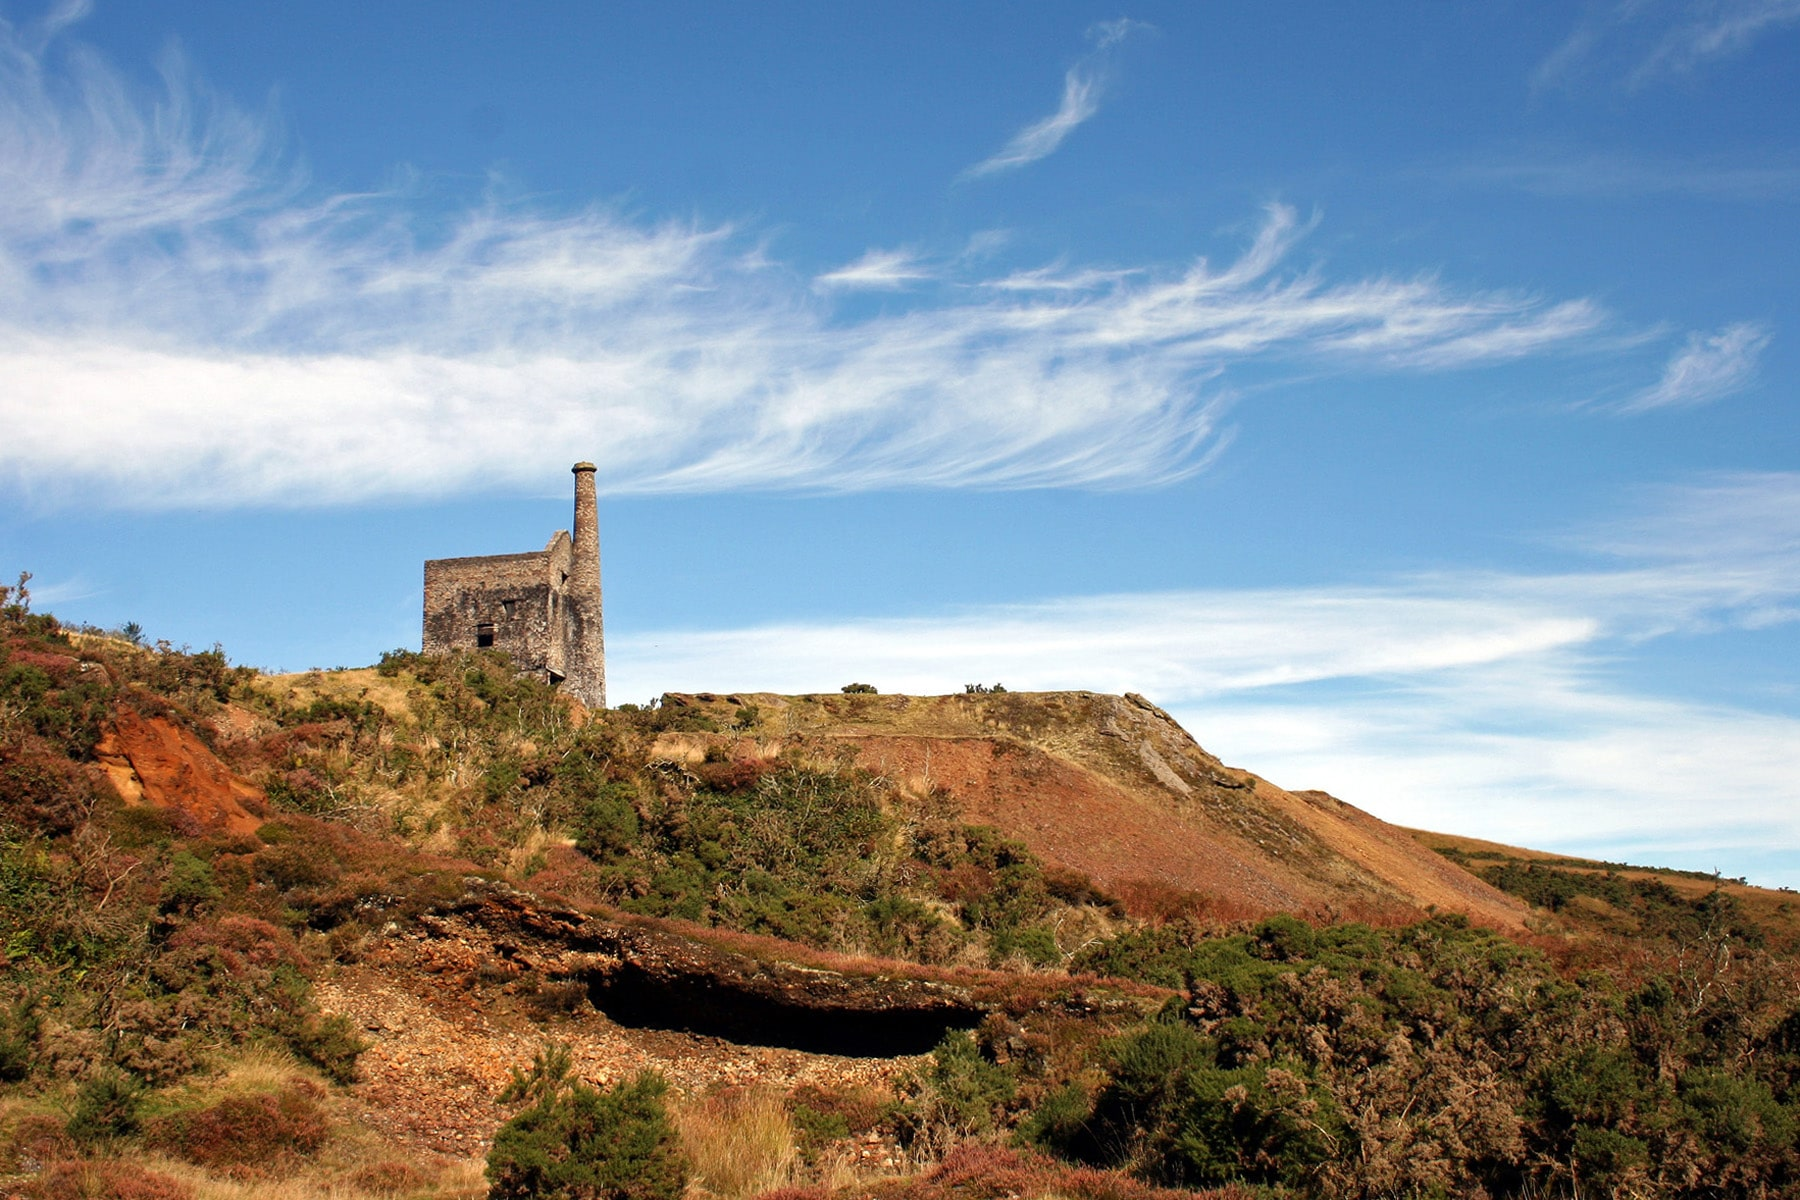 Landscape photo of mine buildings at Devon Great Consuls